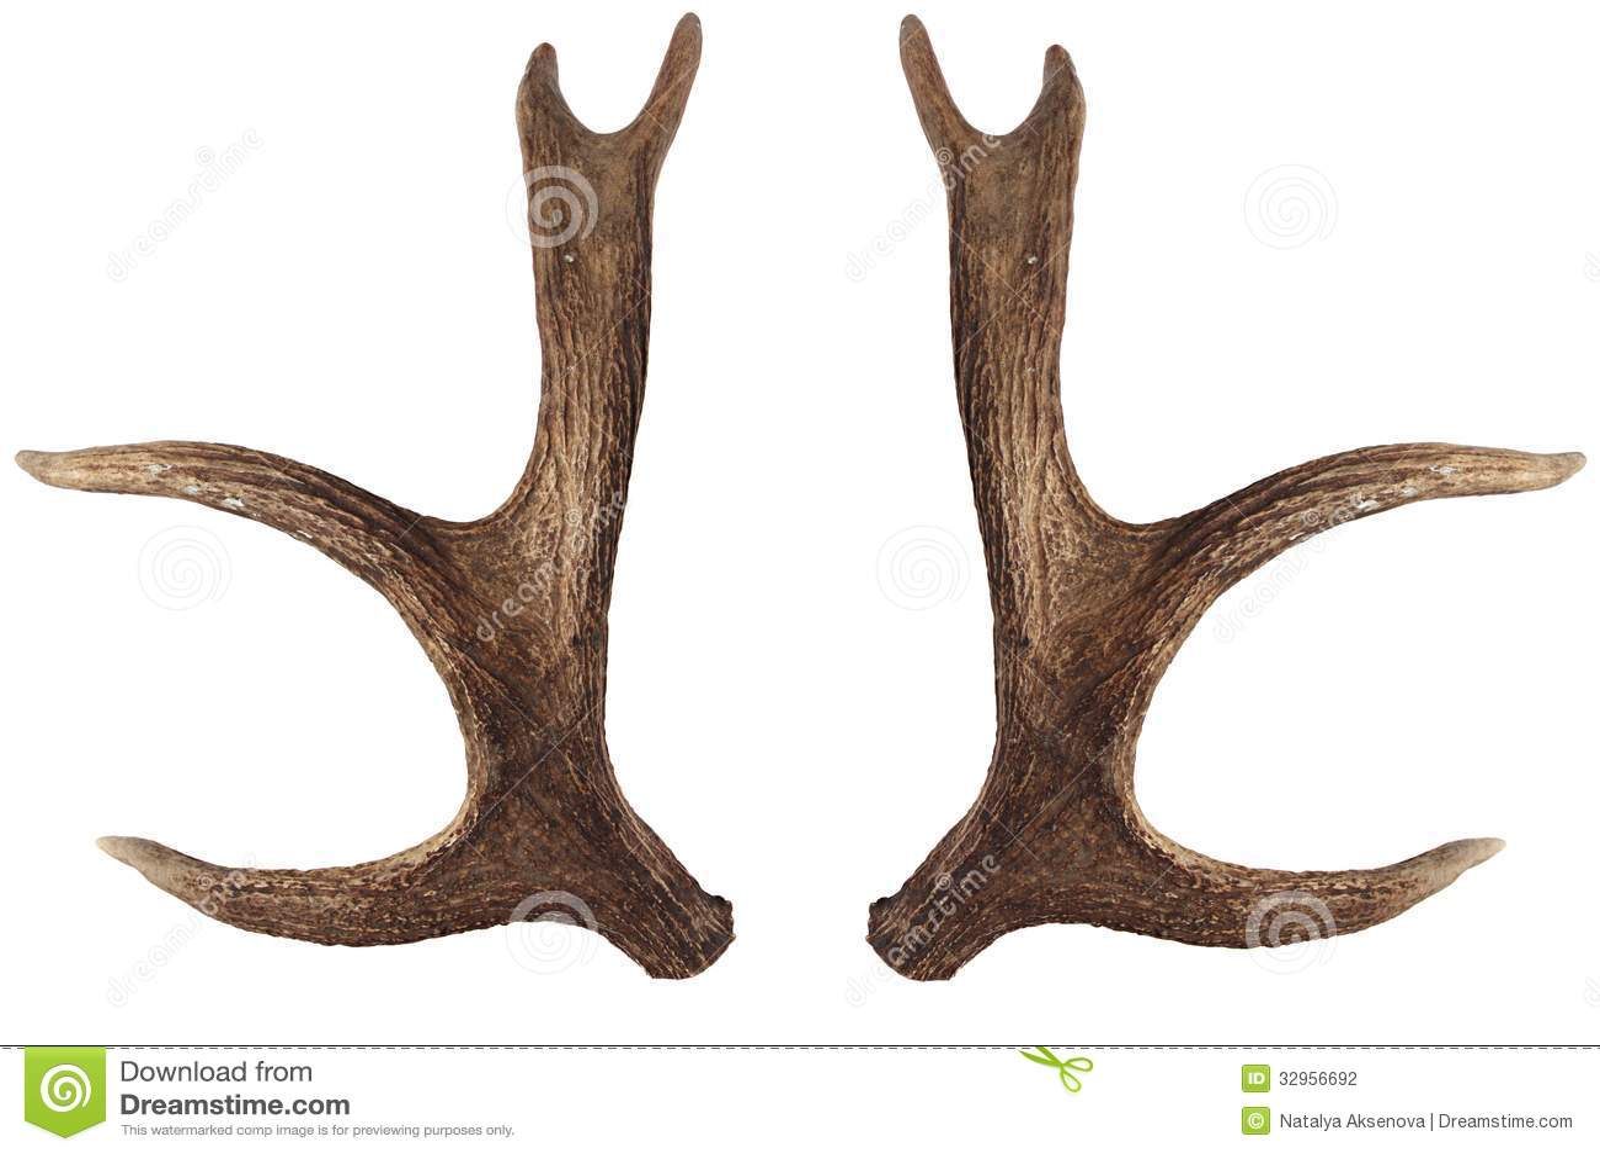 Cuernos De Diablo Png: Elk Horns Isolated On A White Background. Elk Antlers Four